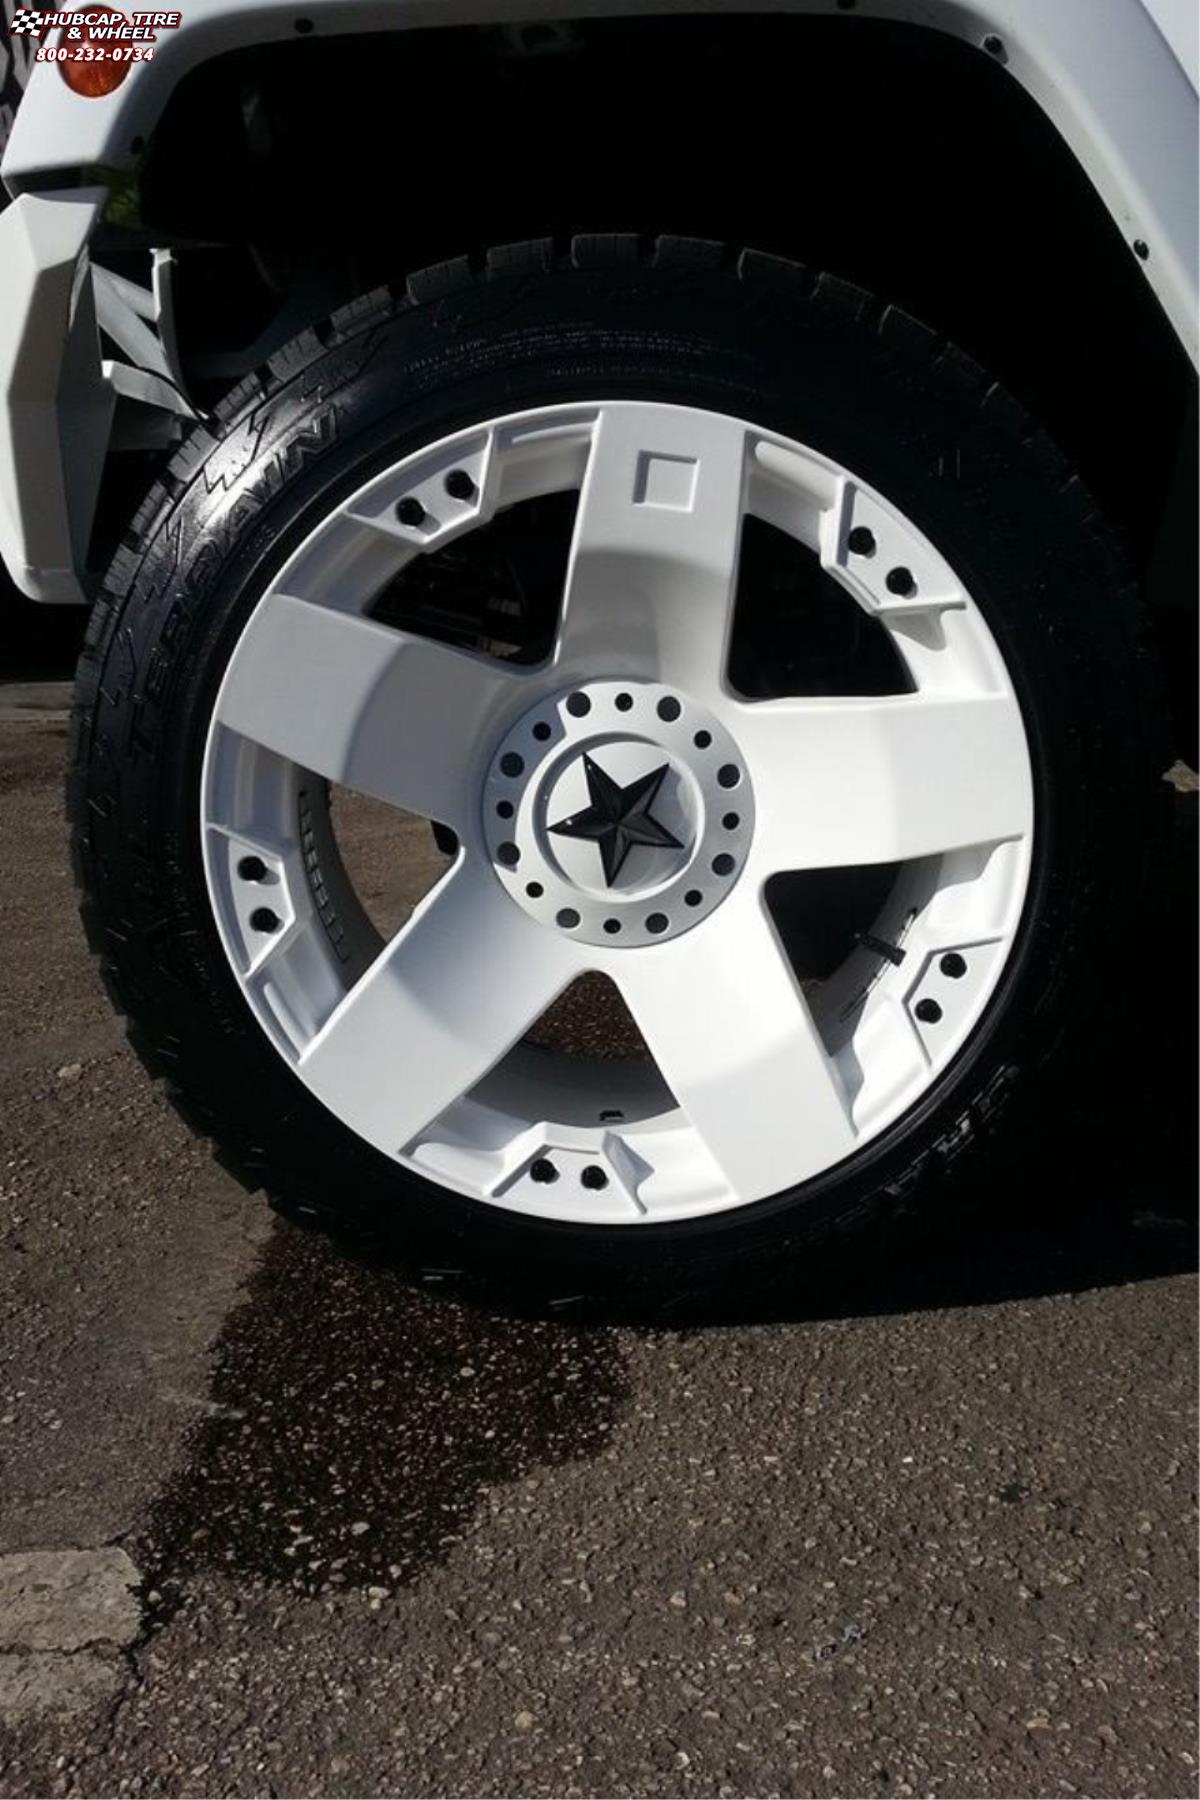 Xd Jeep Wheels : wheels, Wrangler, Series, XD775, Rockstar, Wheels, White